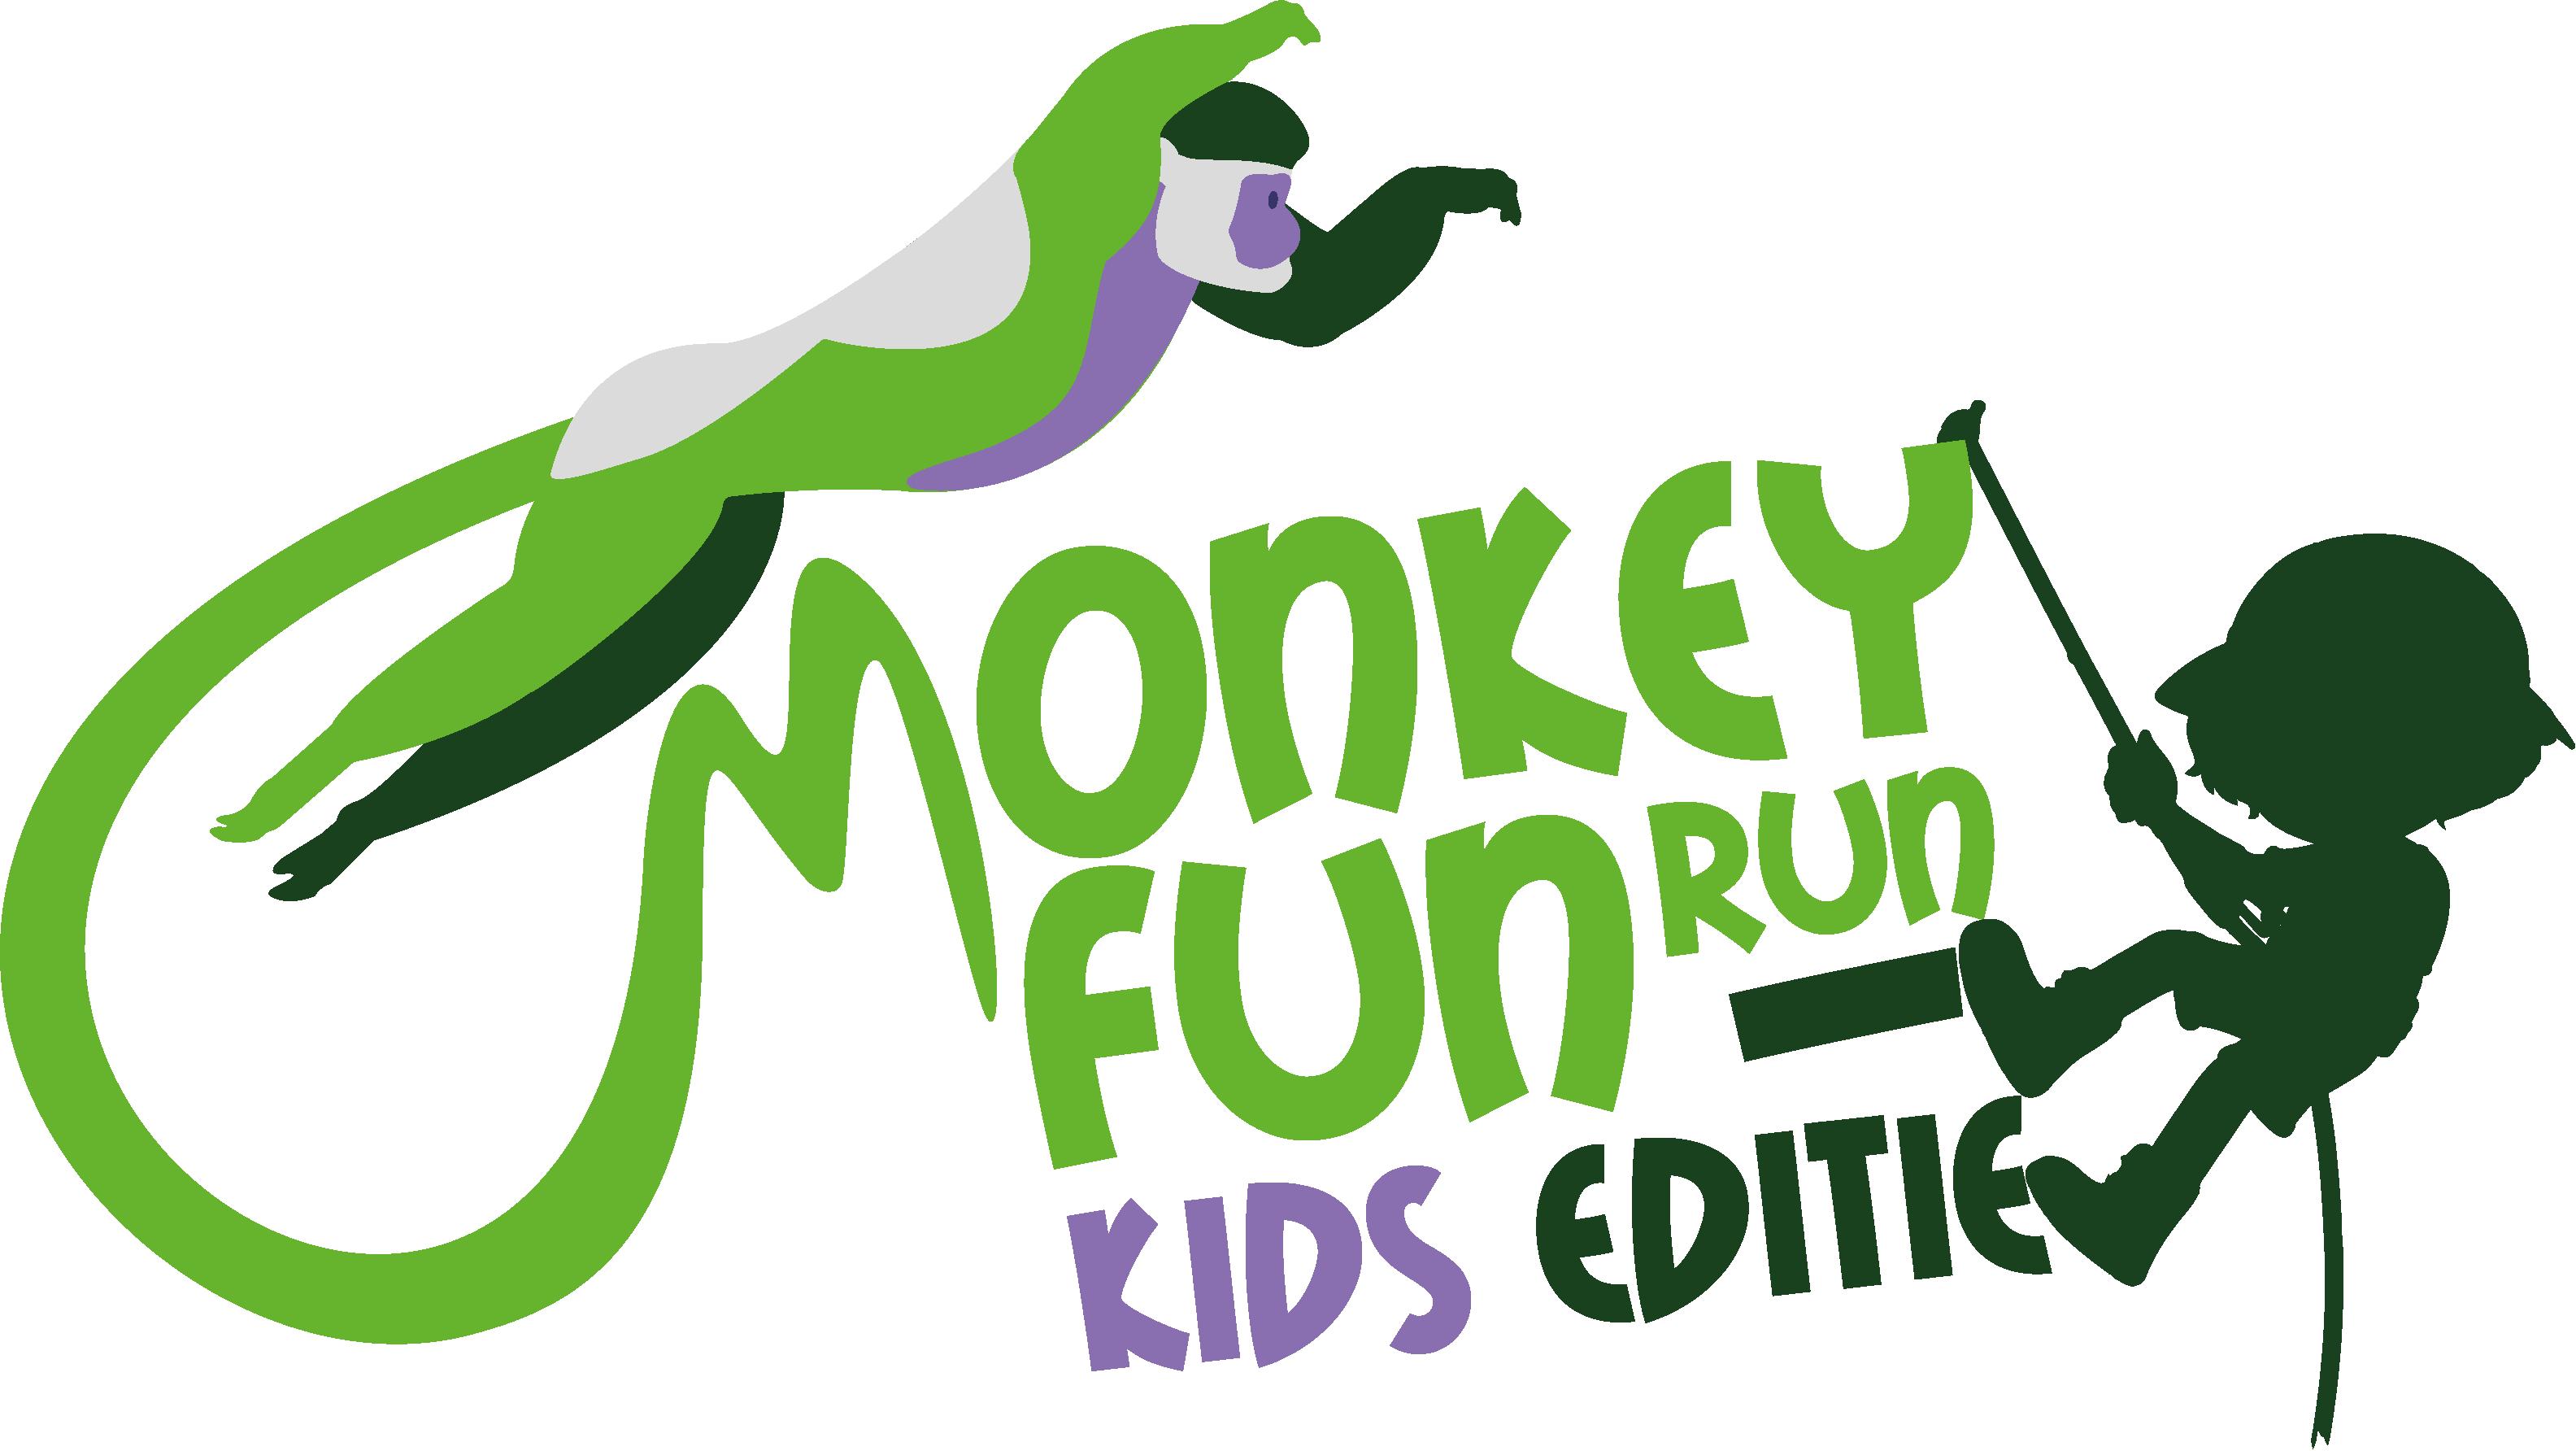 Monkey Fun Run Kids Editie